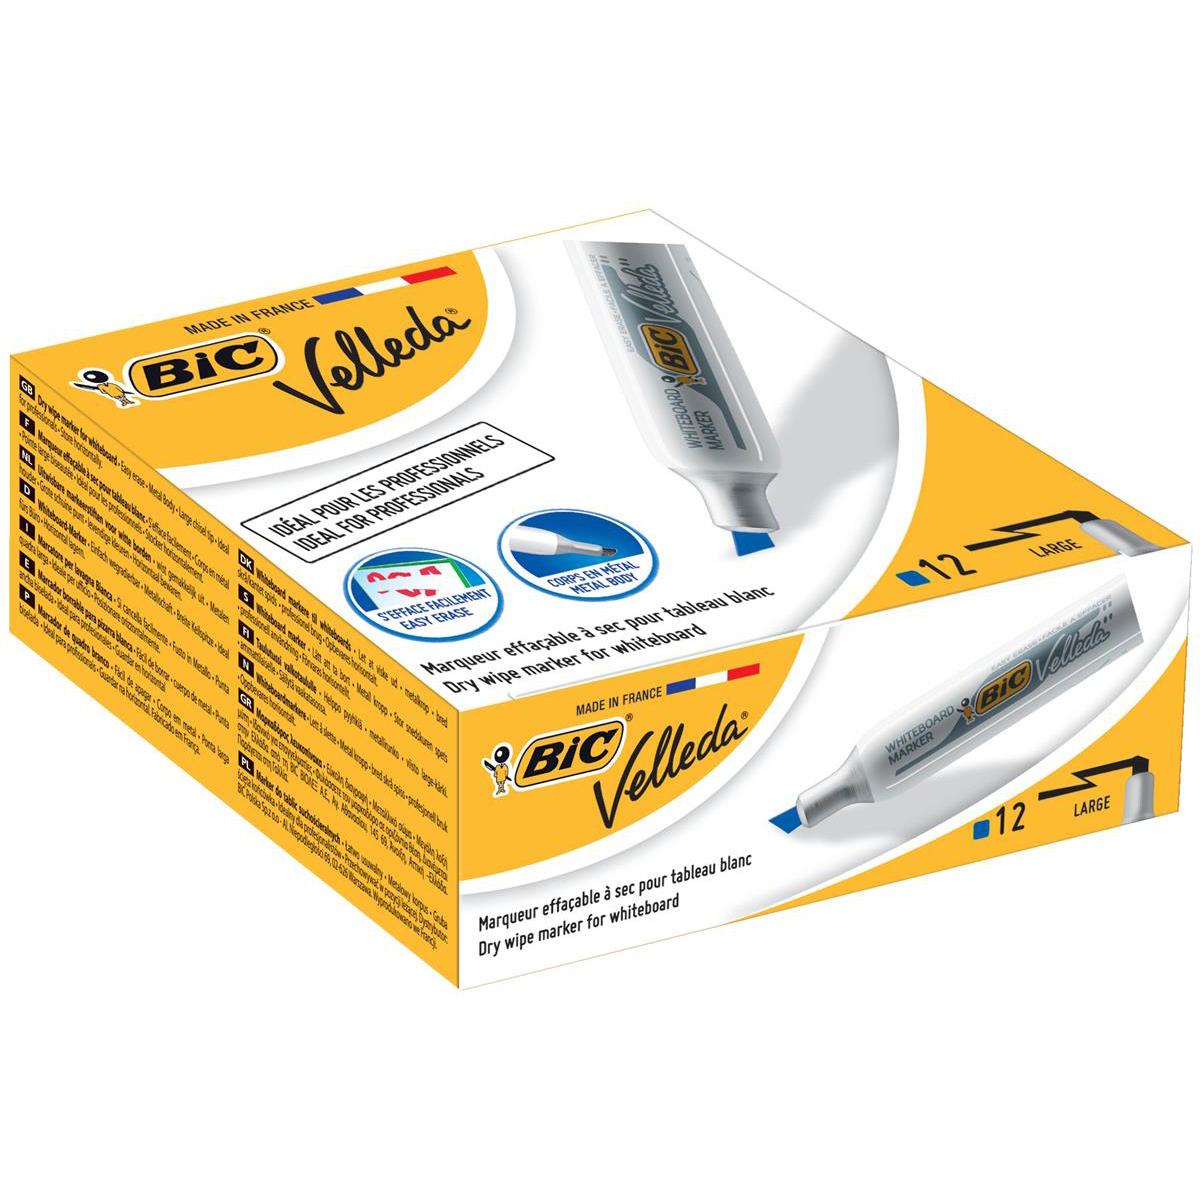 Bic 1781 Whiteboard Marker Chisel Tip Line Width 3.5-5.5mm Assorted Ref 119900178 Pack 4